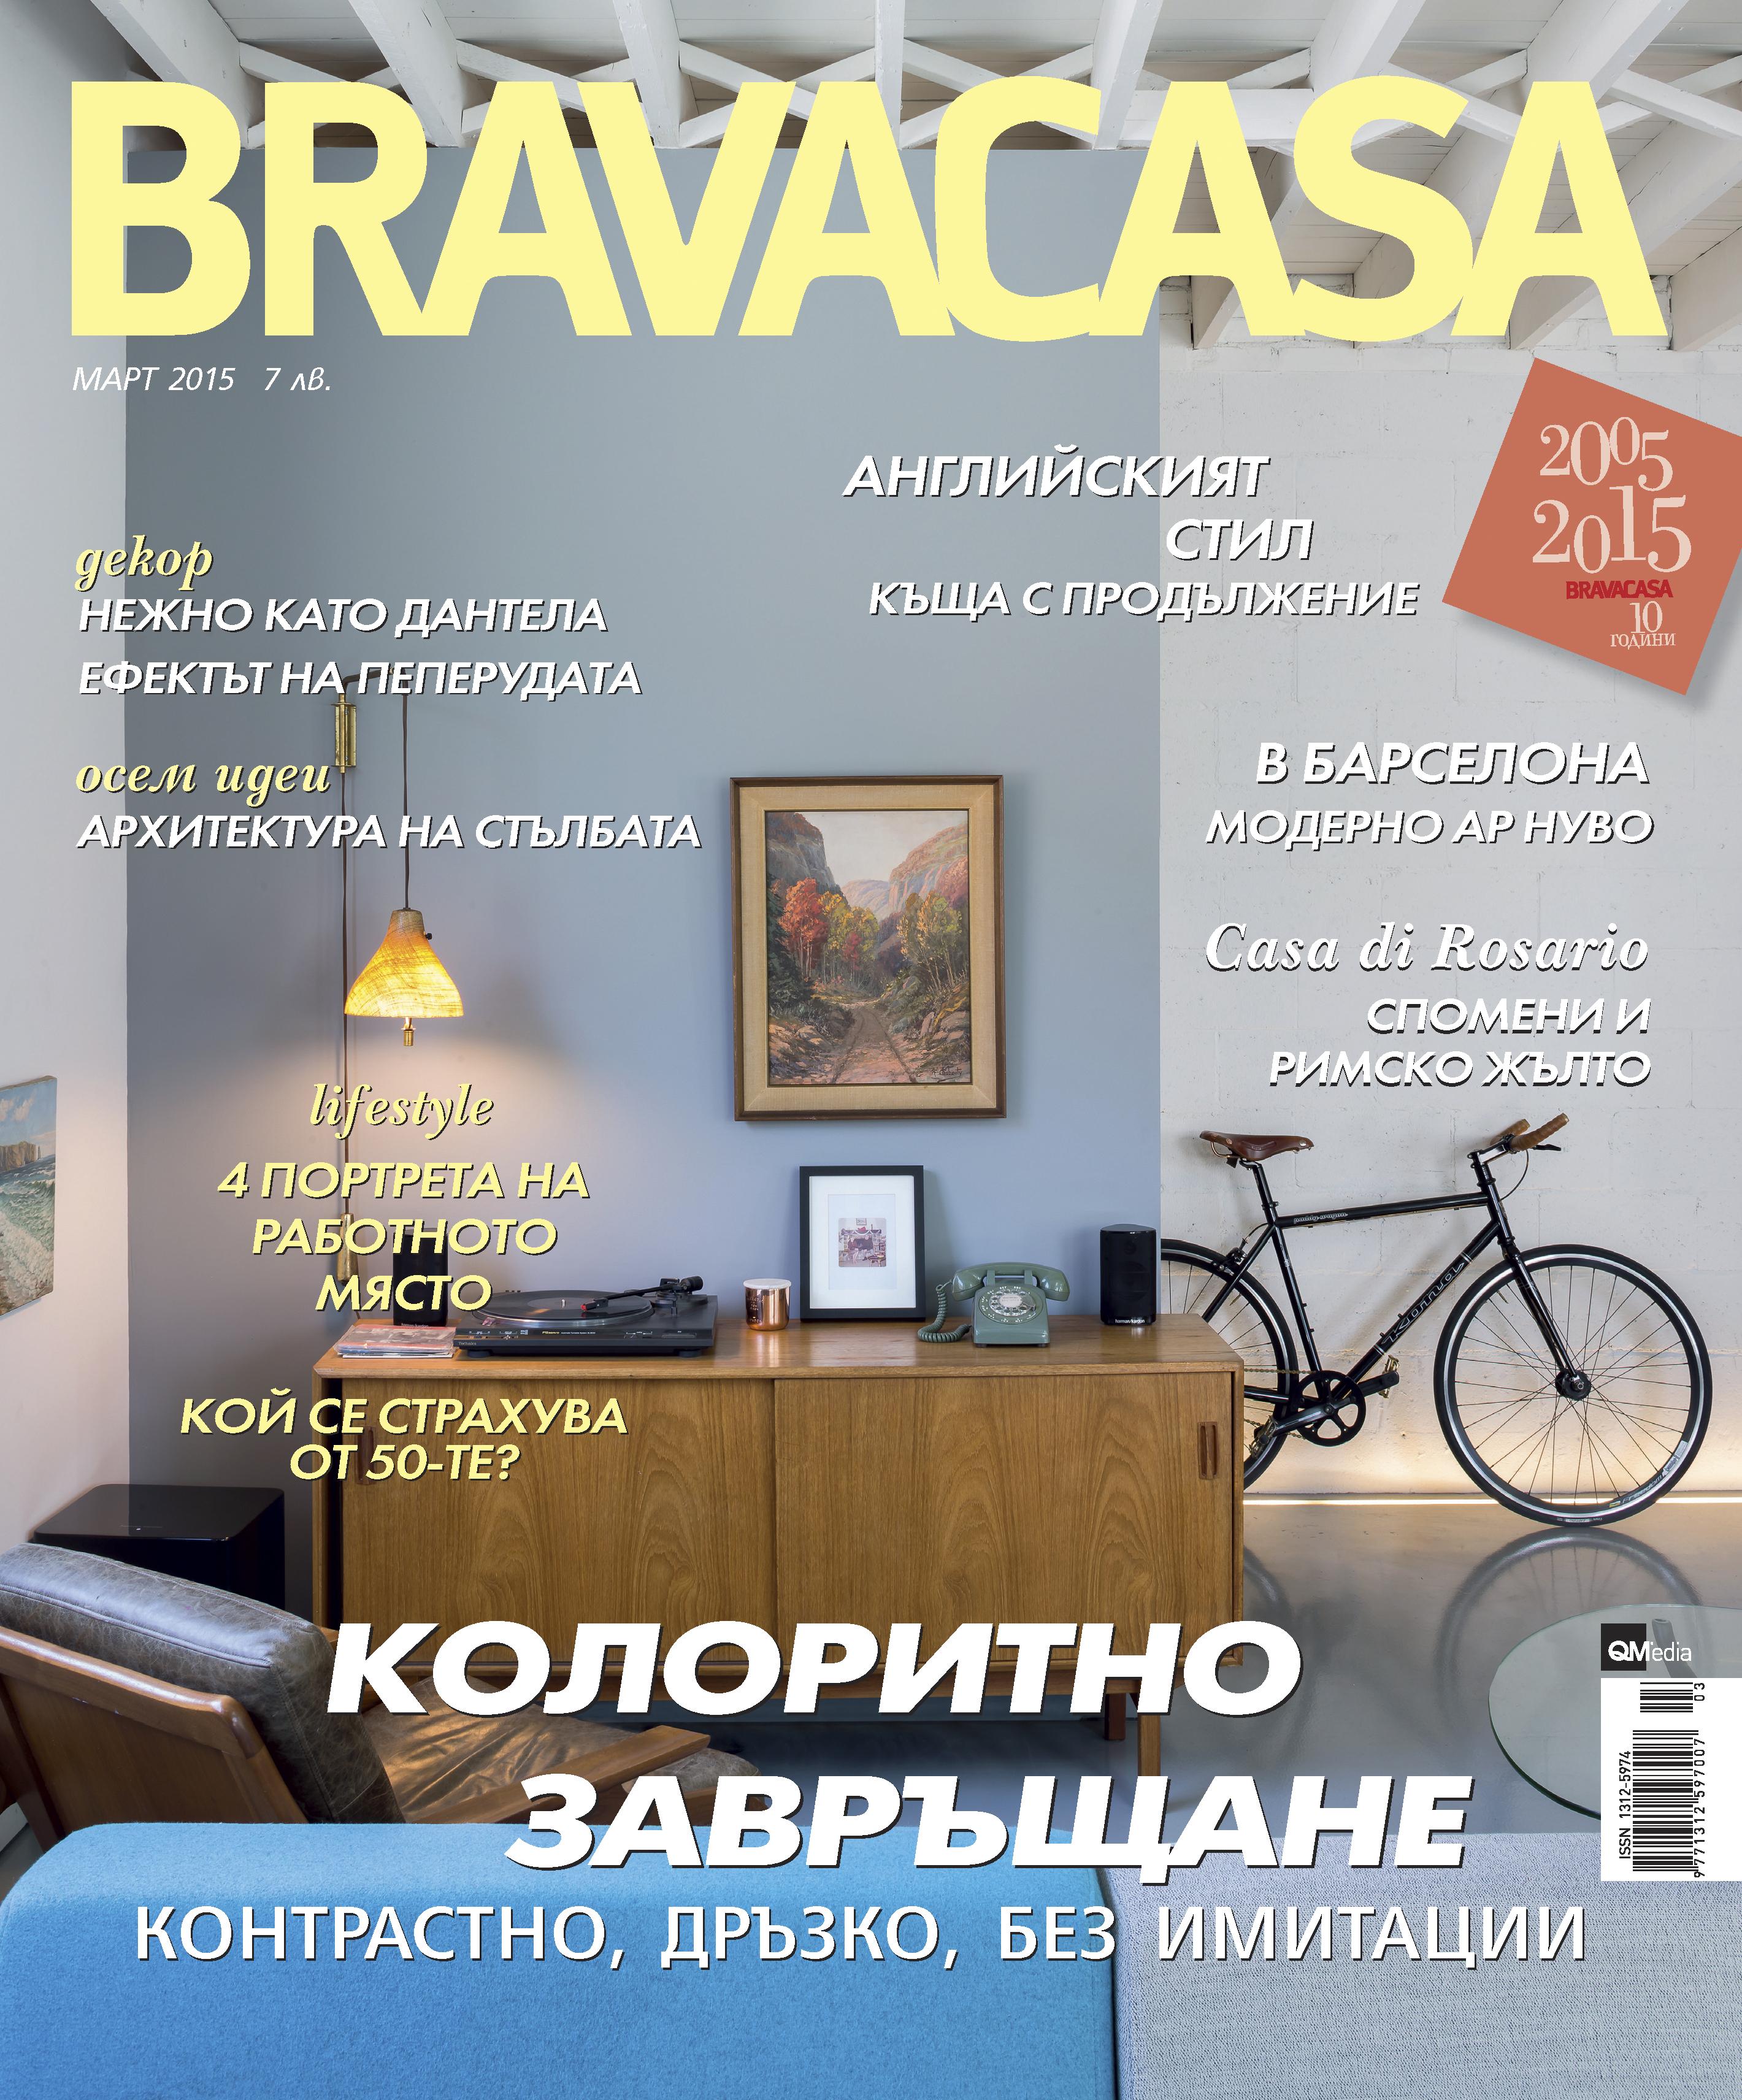 N°7 | BRAVACASA